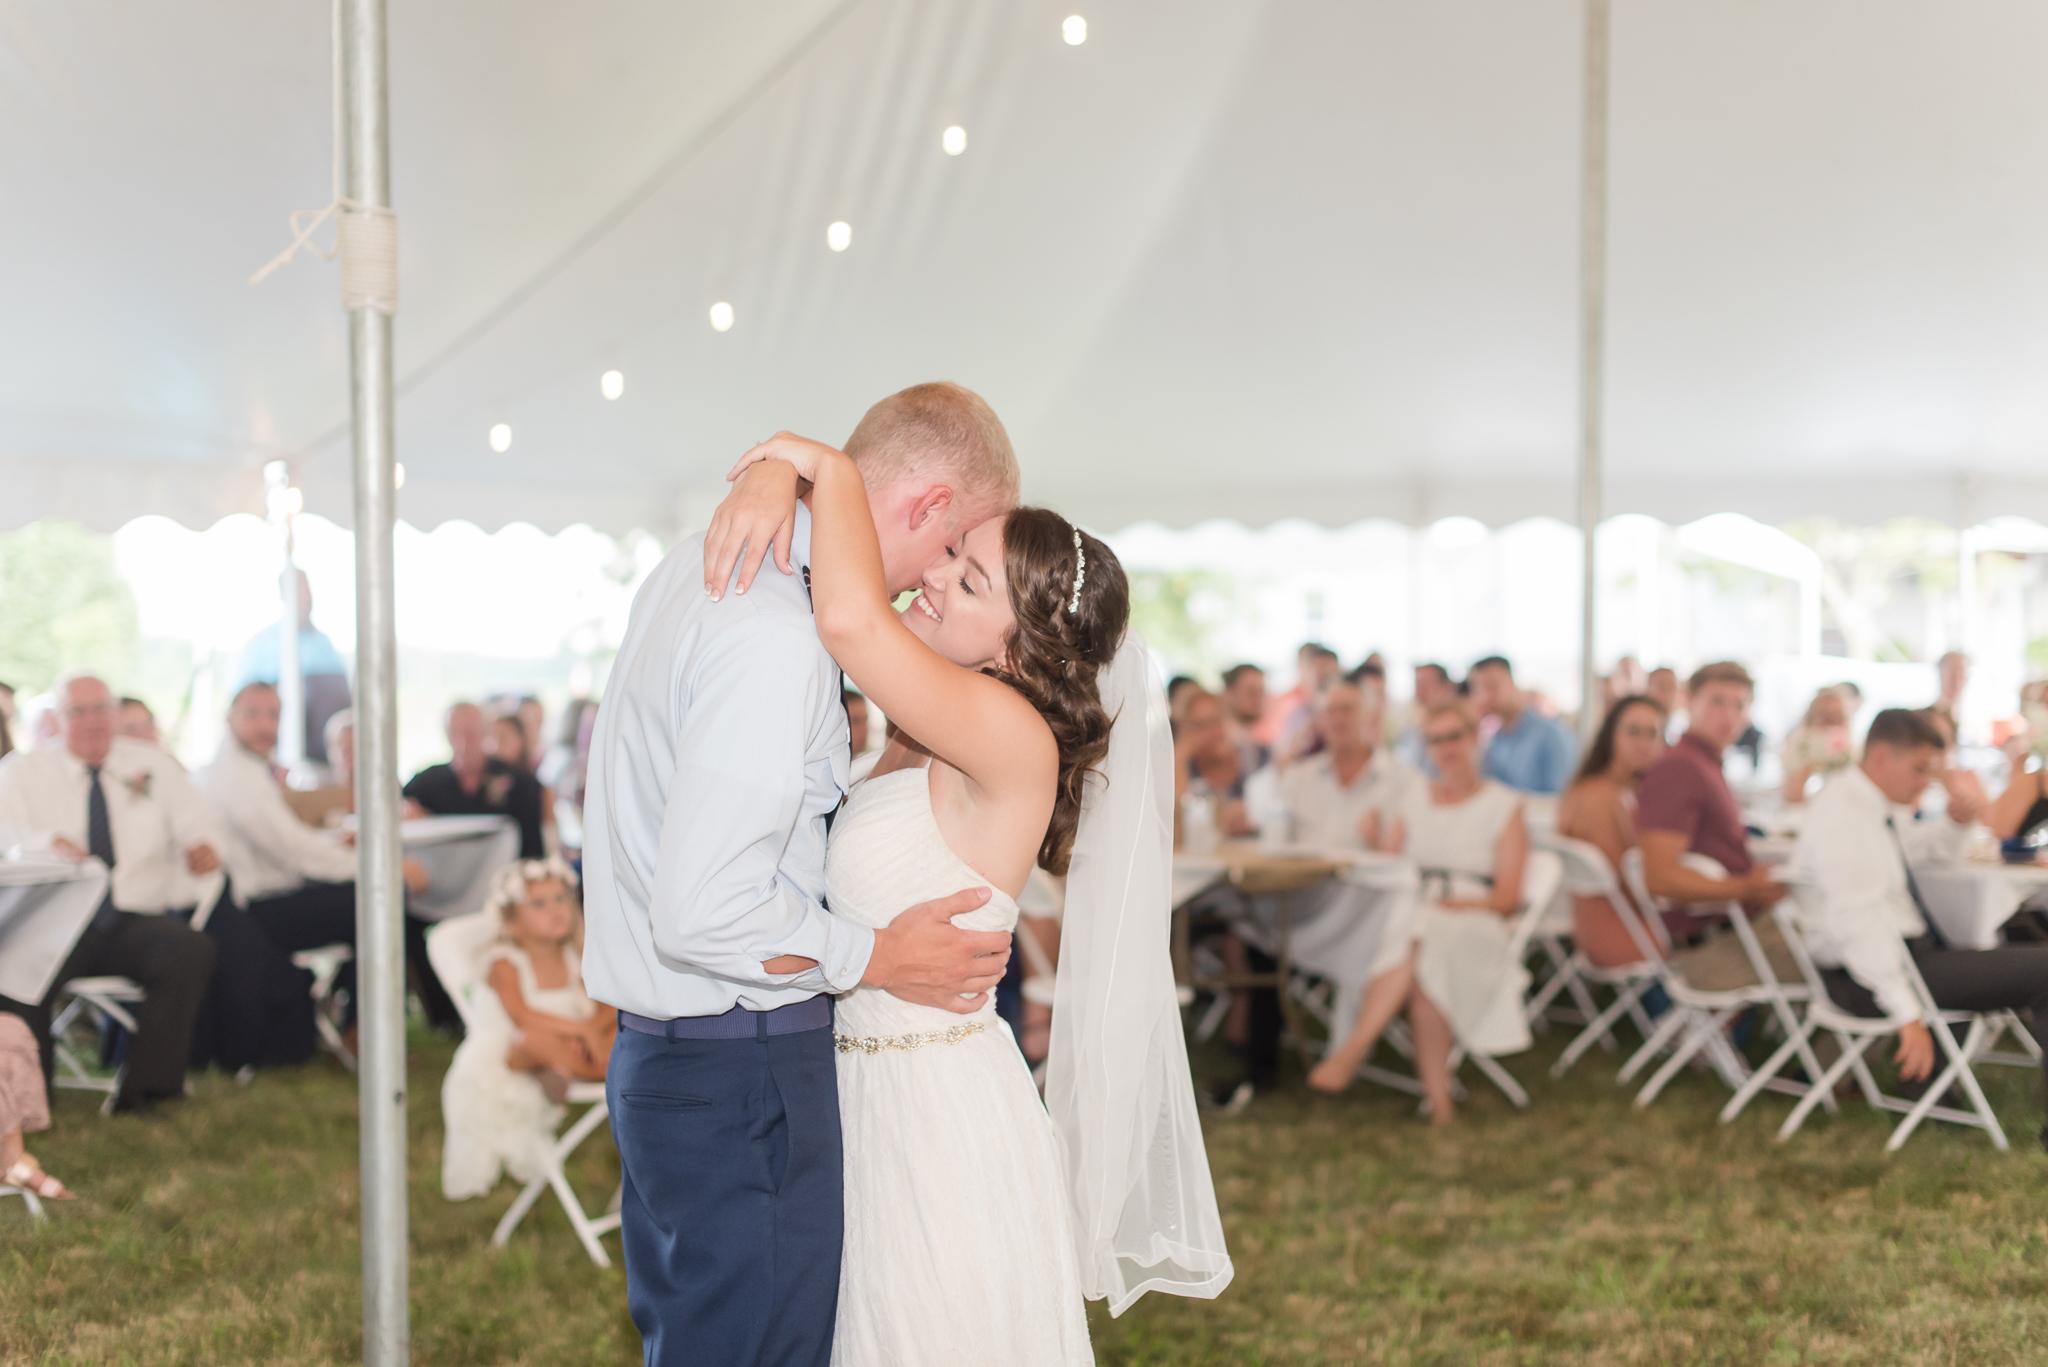 Anderson, Indiana Wedding Photographers5174.jpg